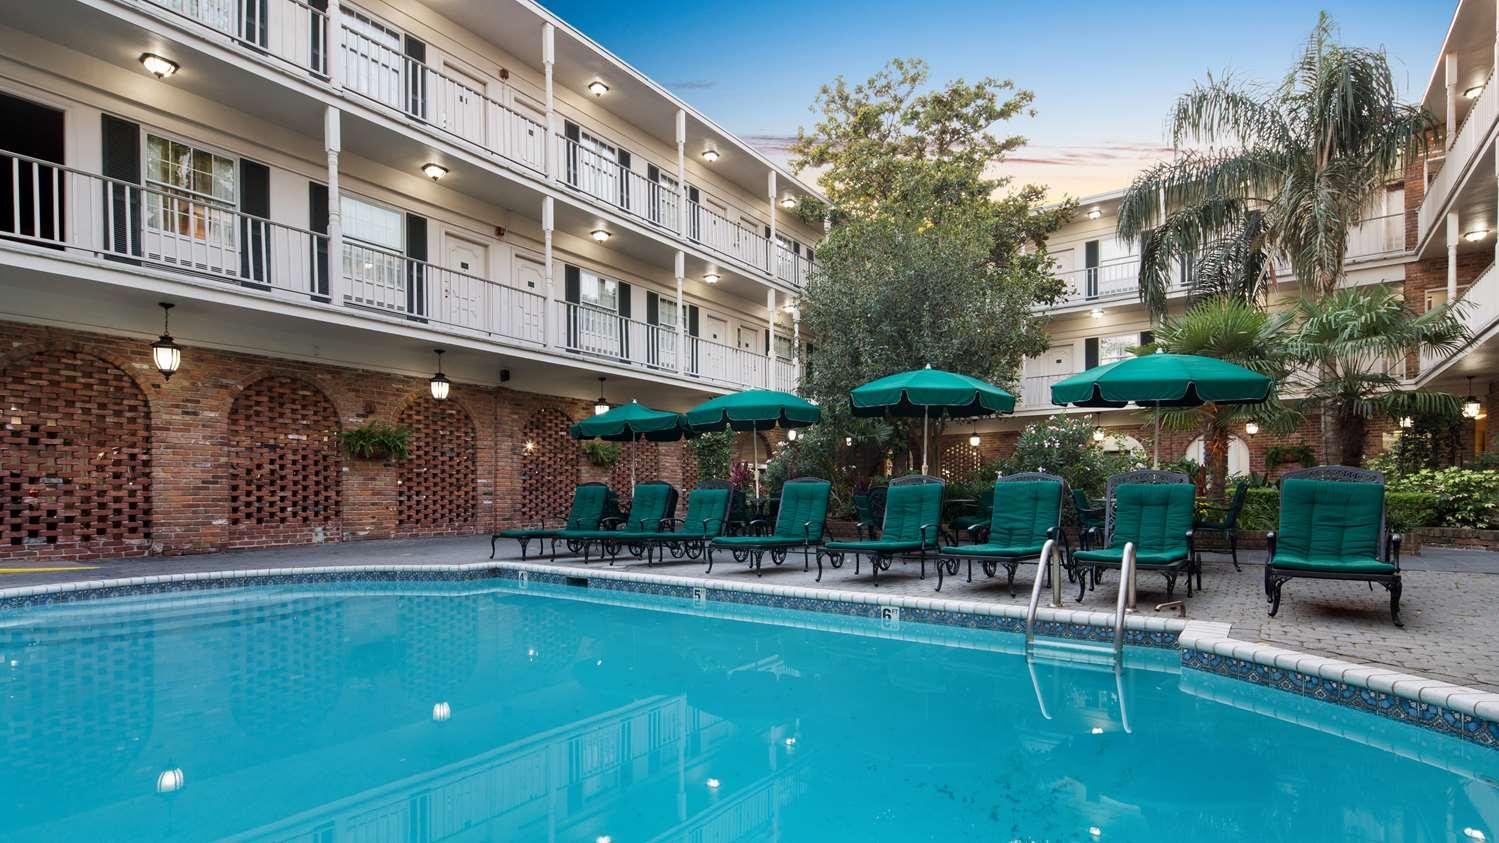 Pool - Best Western Plus French Quarter Landmark Hotel